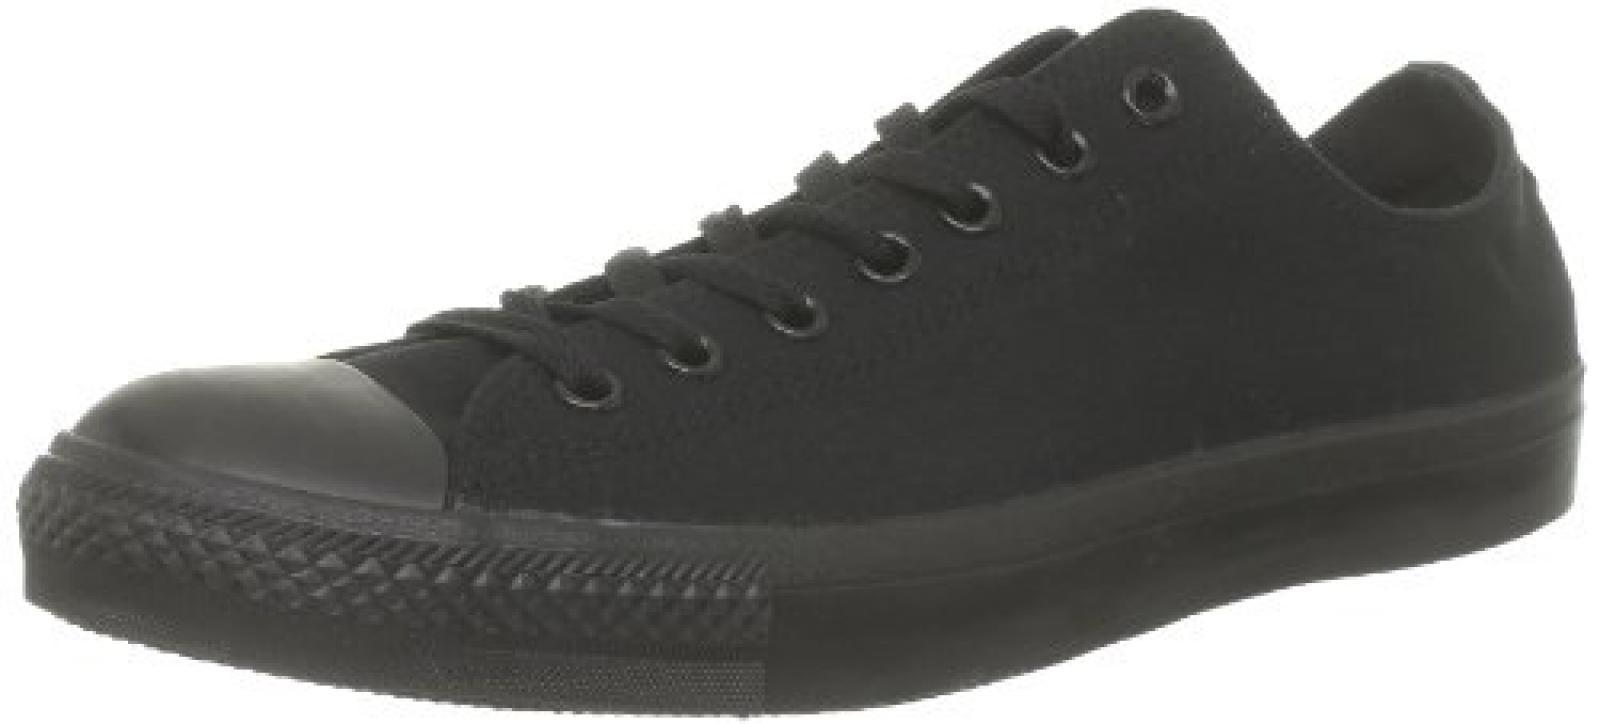 Converse Ctas Mono Ox 015490-70-8 Unisex - Erwachsene Sneaker